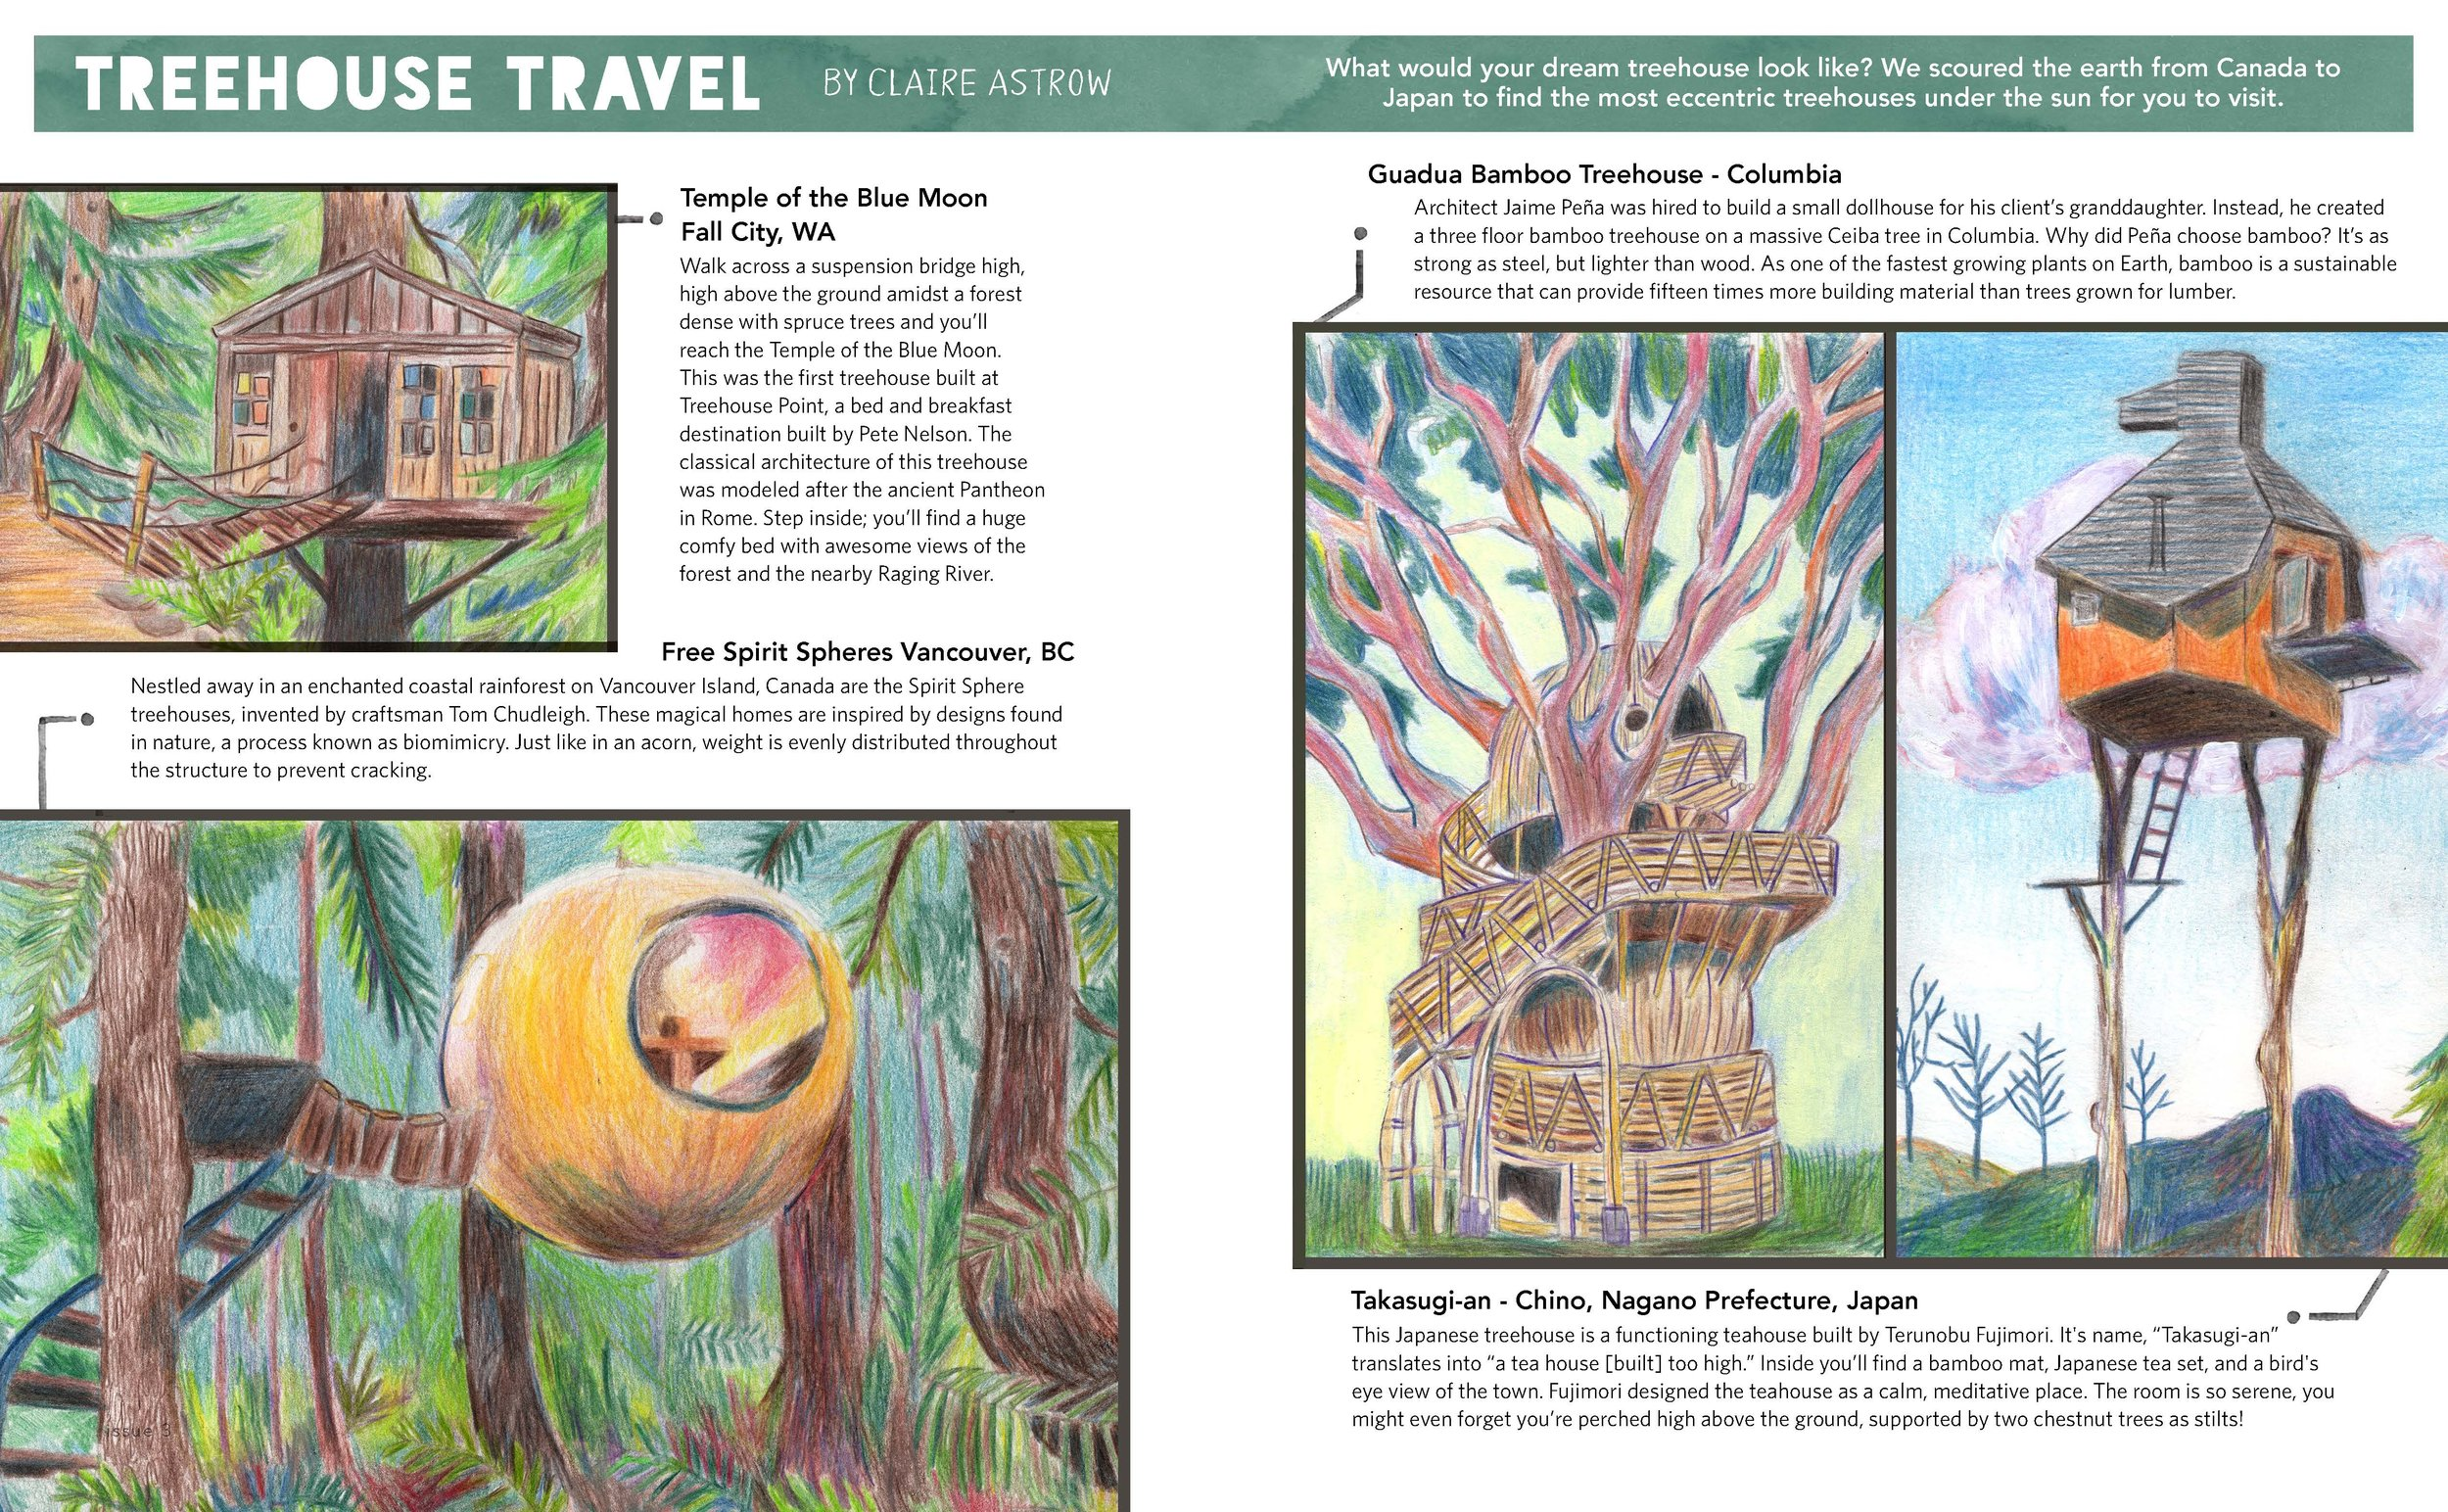 Tree house Travel featured in ILLUSTORIA Magazine Issue #3. 2017.